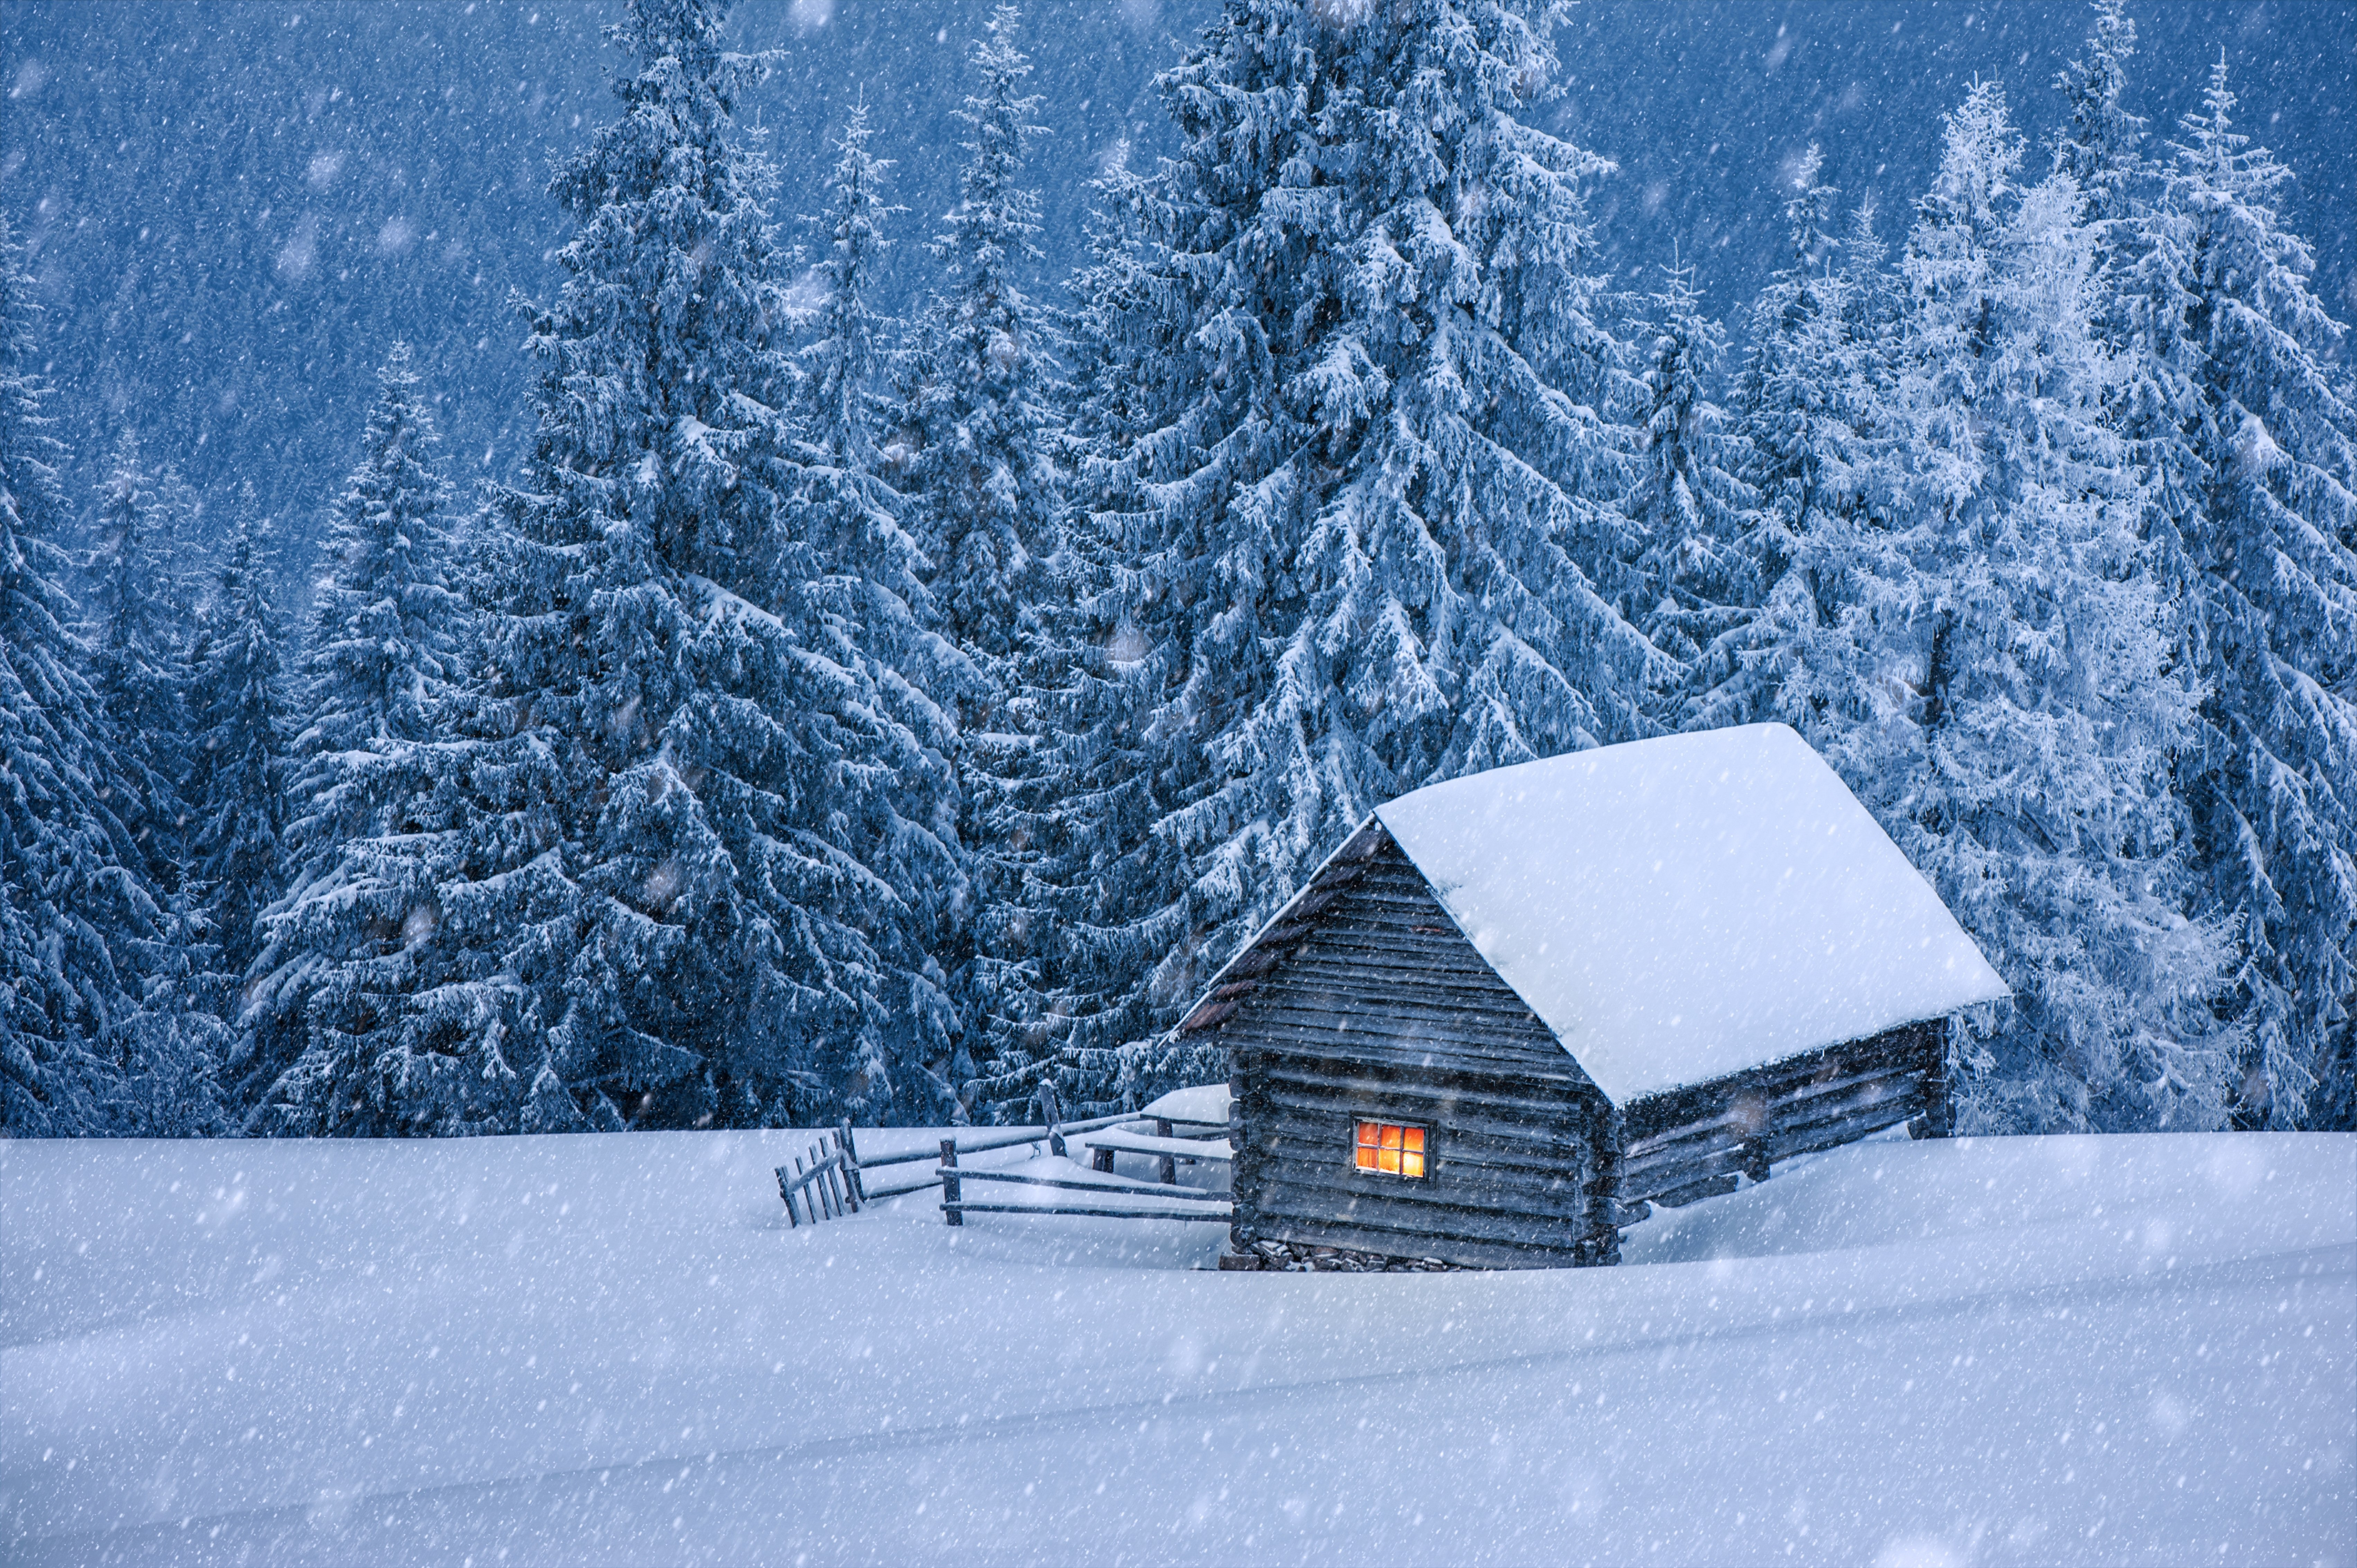 Nature Hut Forest Snow Winter Trees Cabin Wallpaper 6810x4530 842696 Wallpaperup